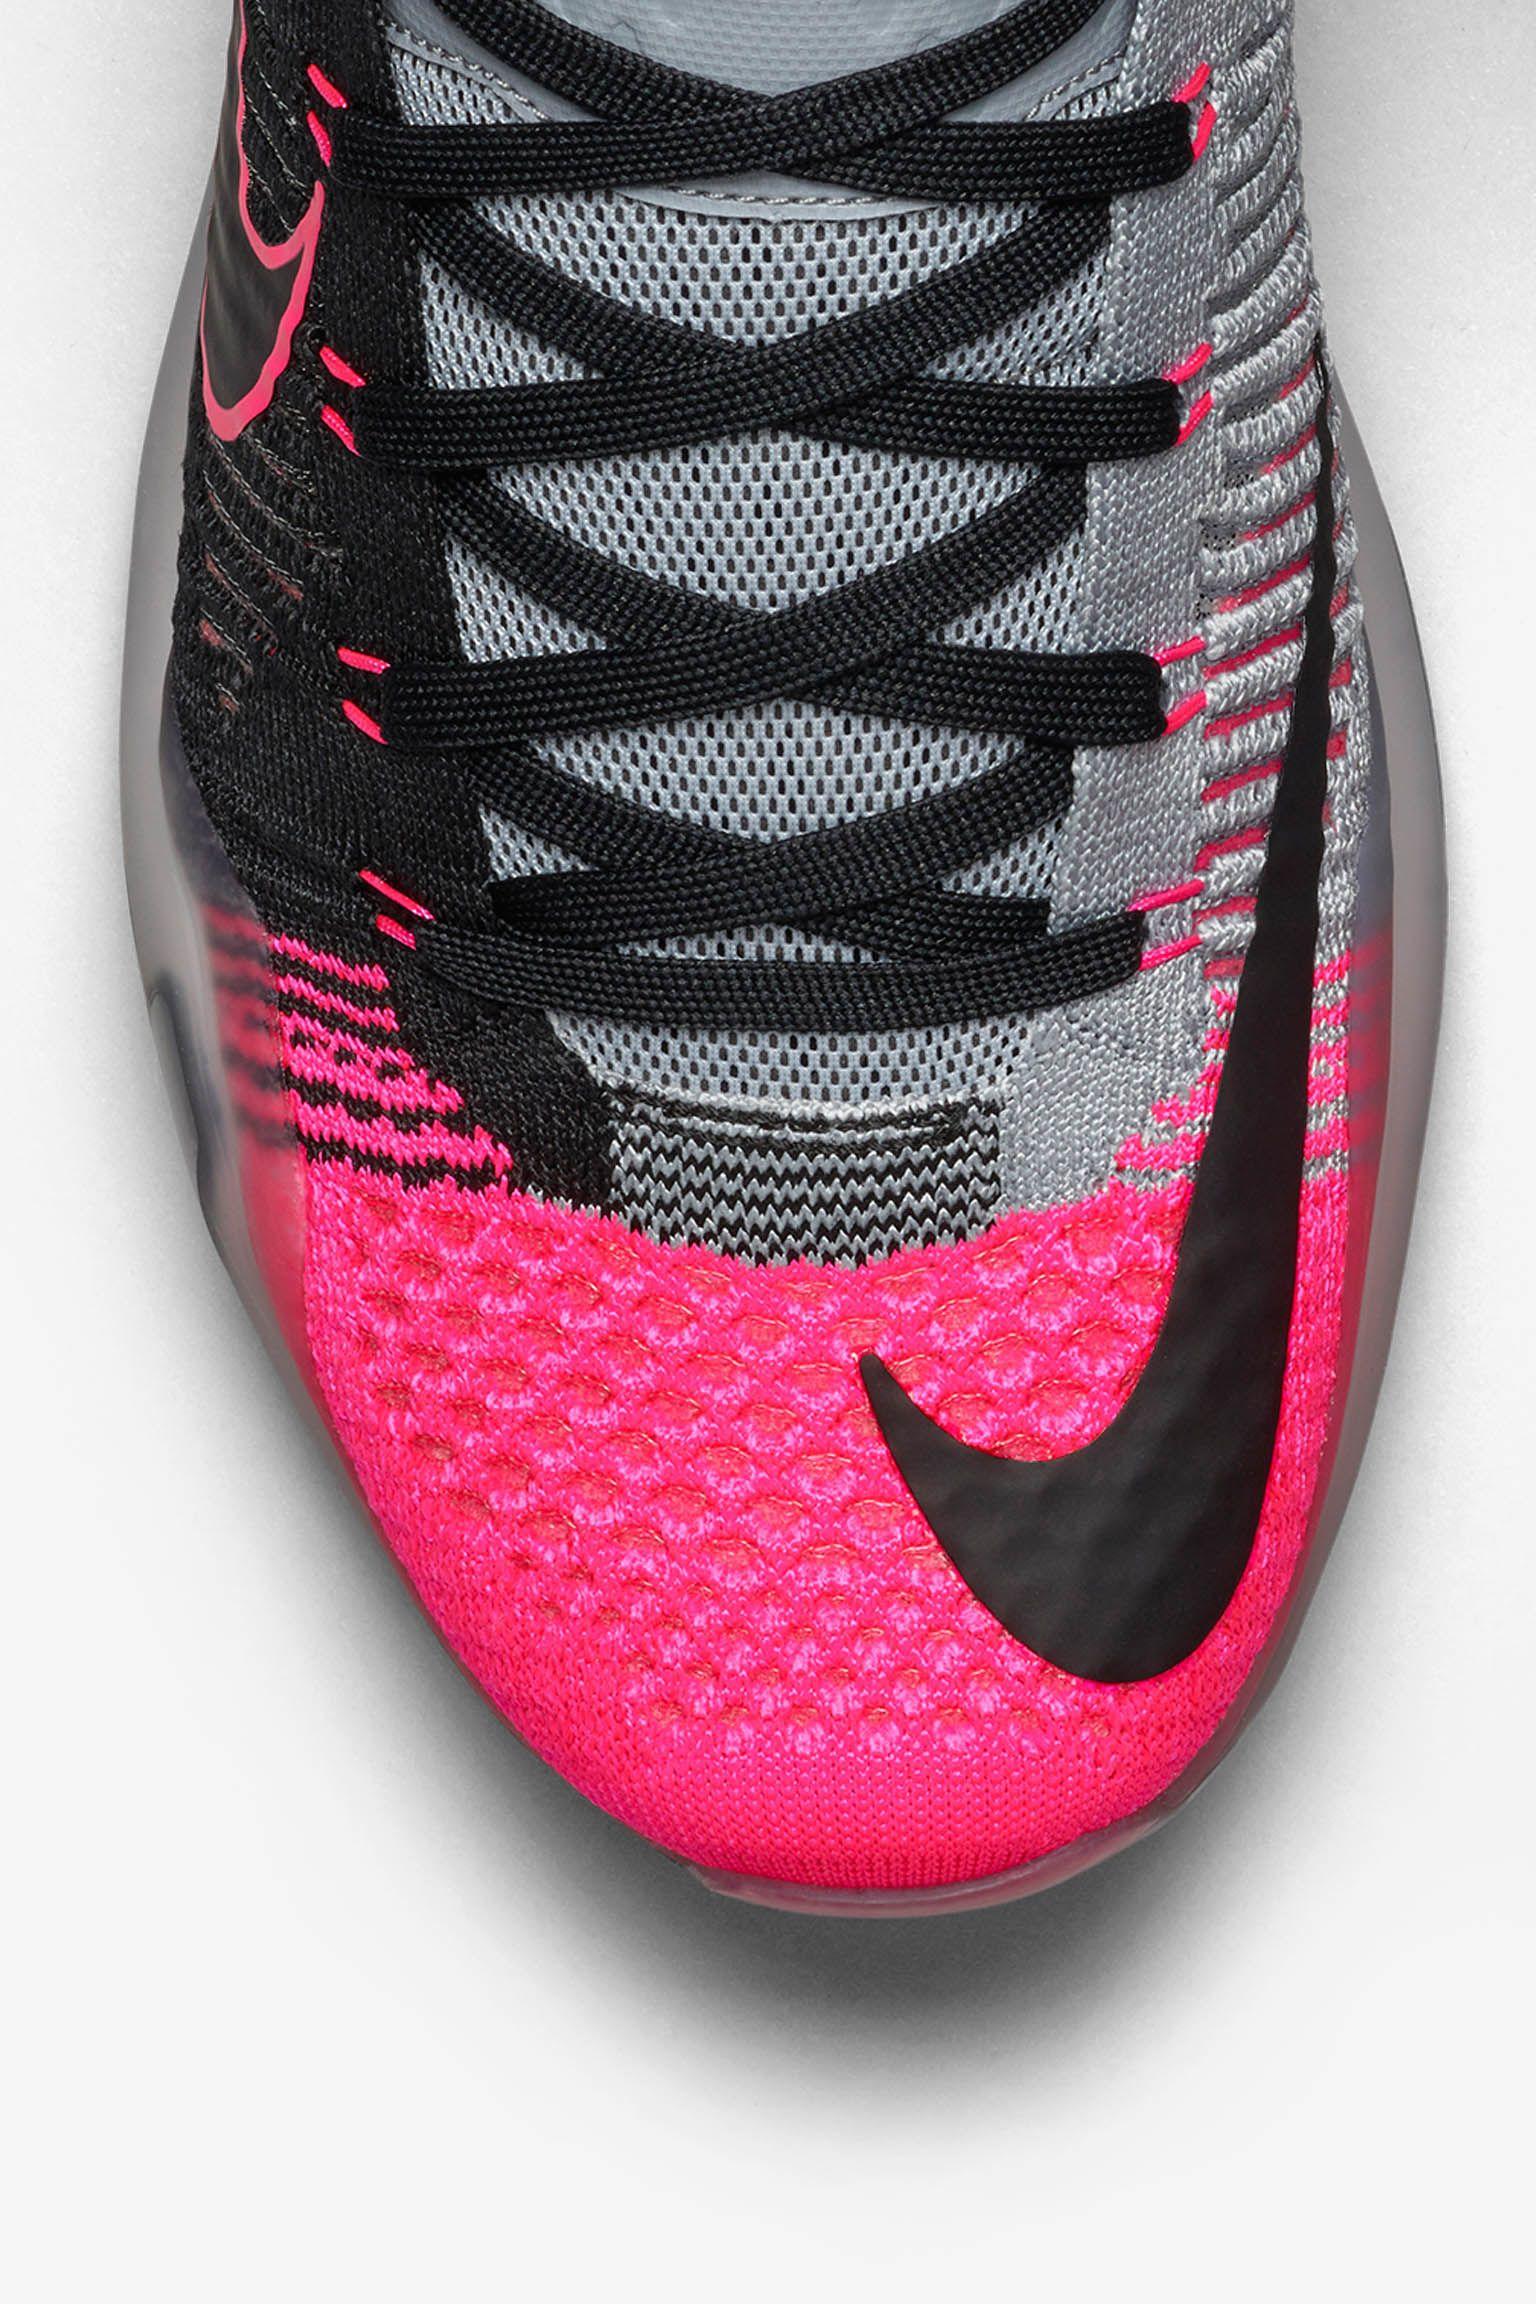 Nike Kobe 10 Elite Low 'Mambacurial' Release Date